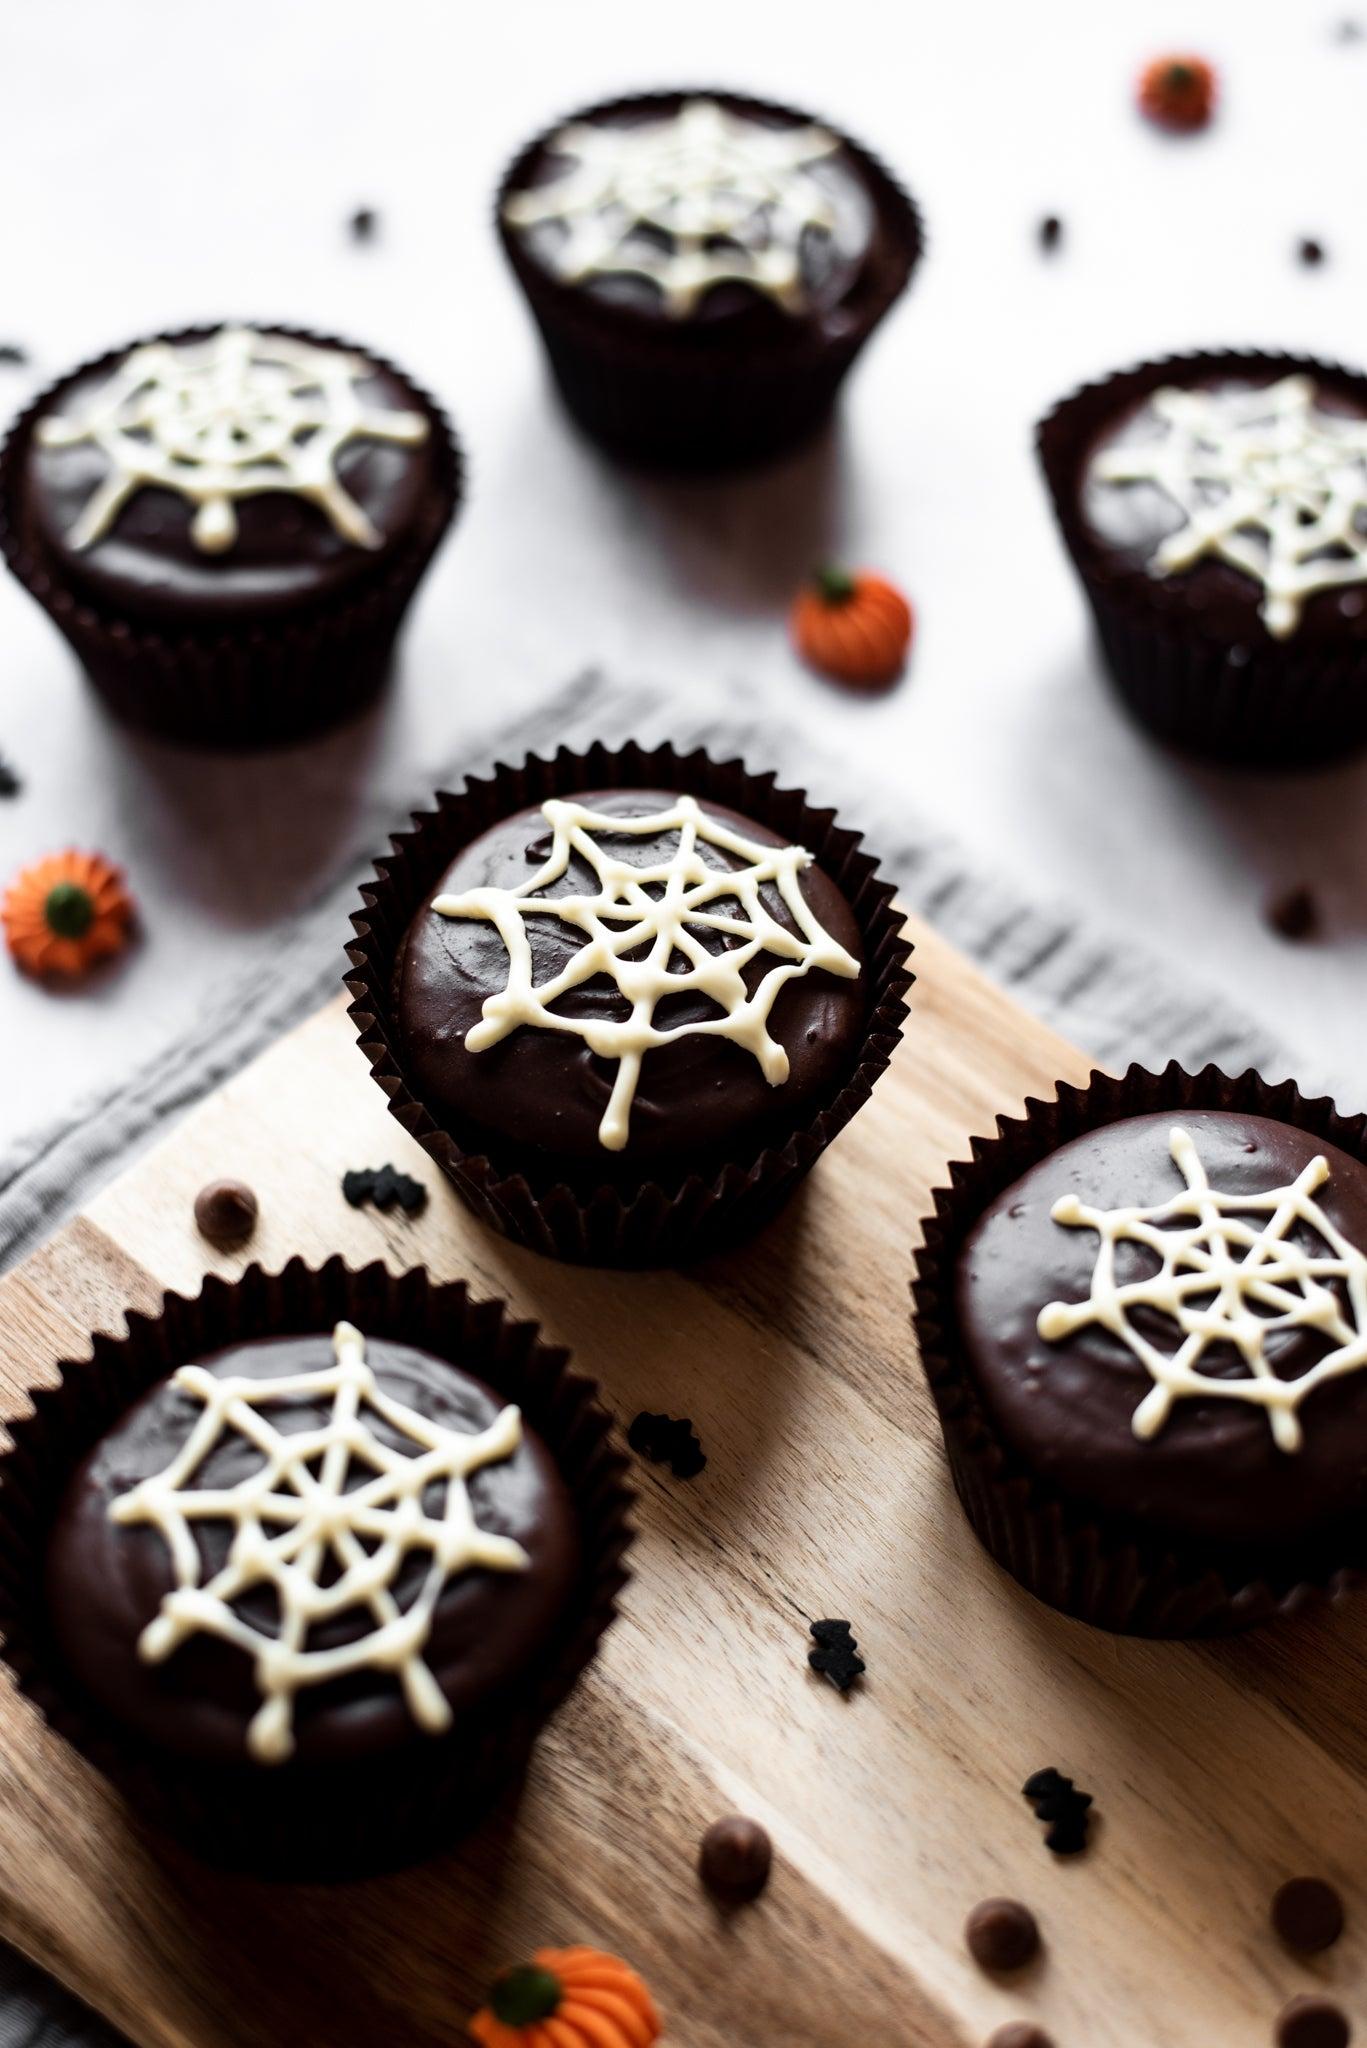 Spider-Web-Cakes-WEB-RES-4.jpg